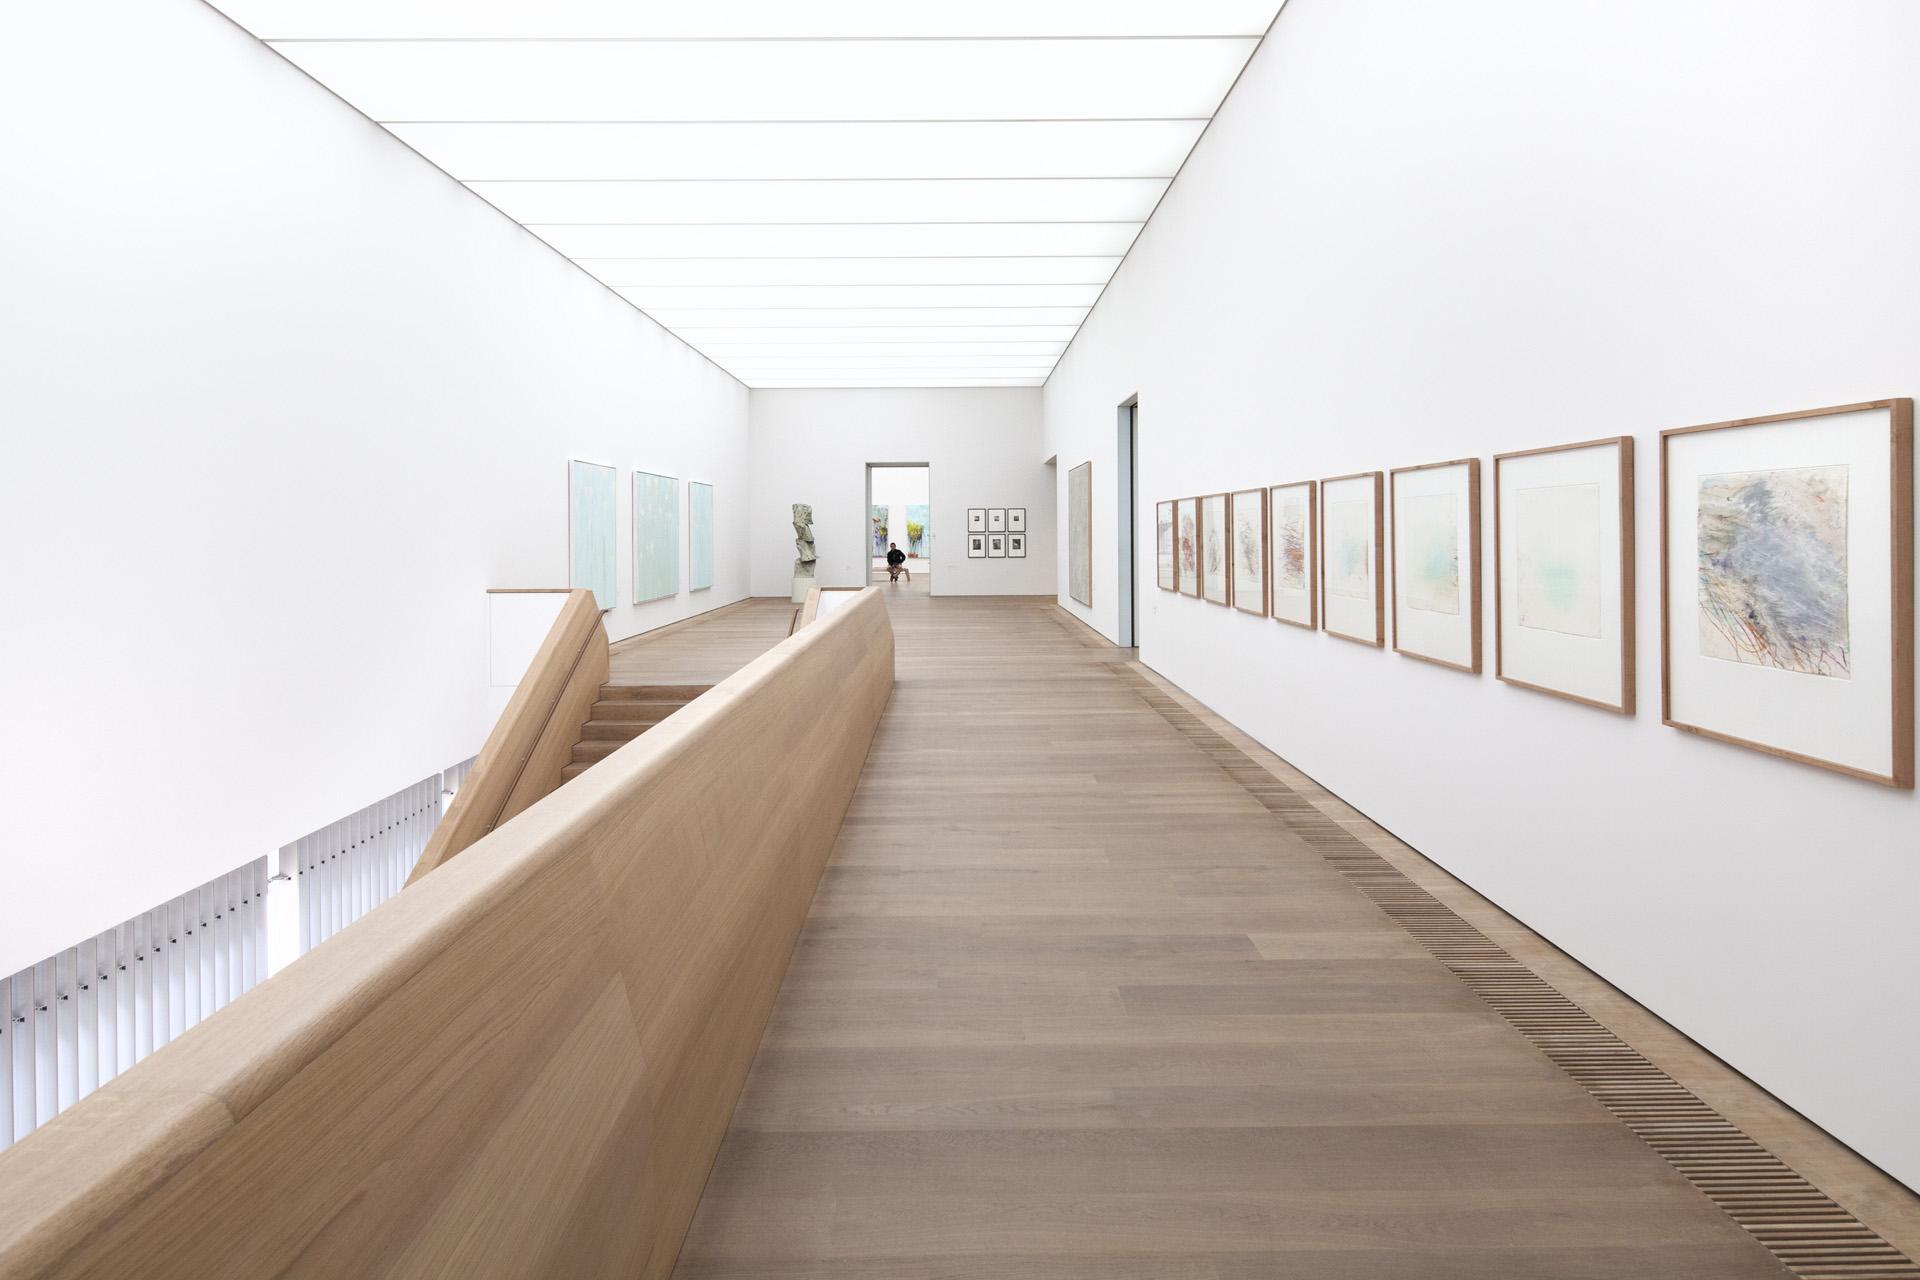 IMG 3396 - Museum Brandhorst München